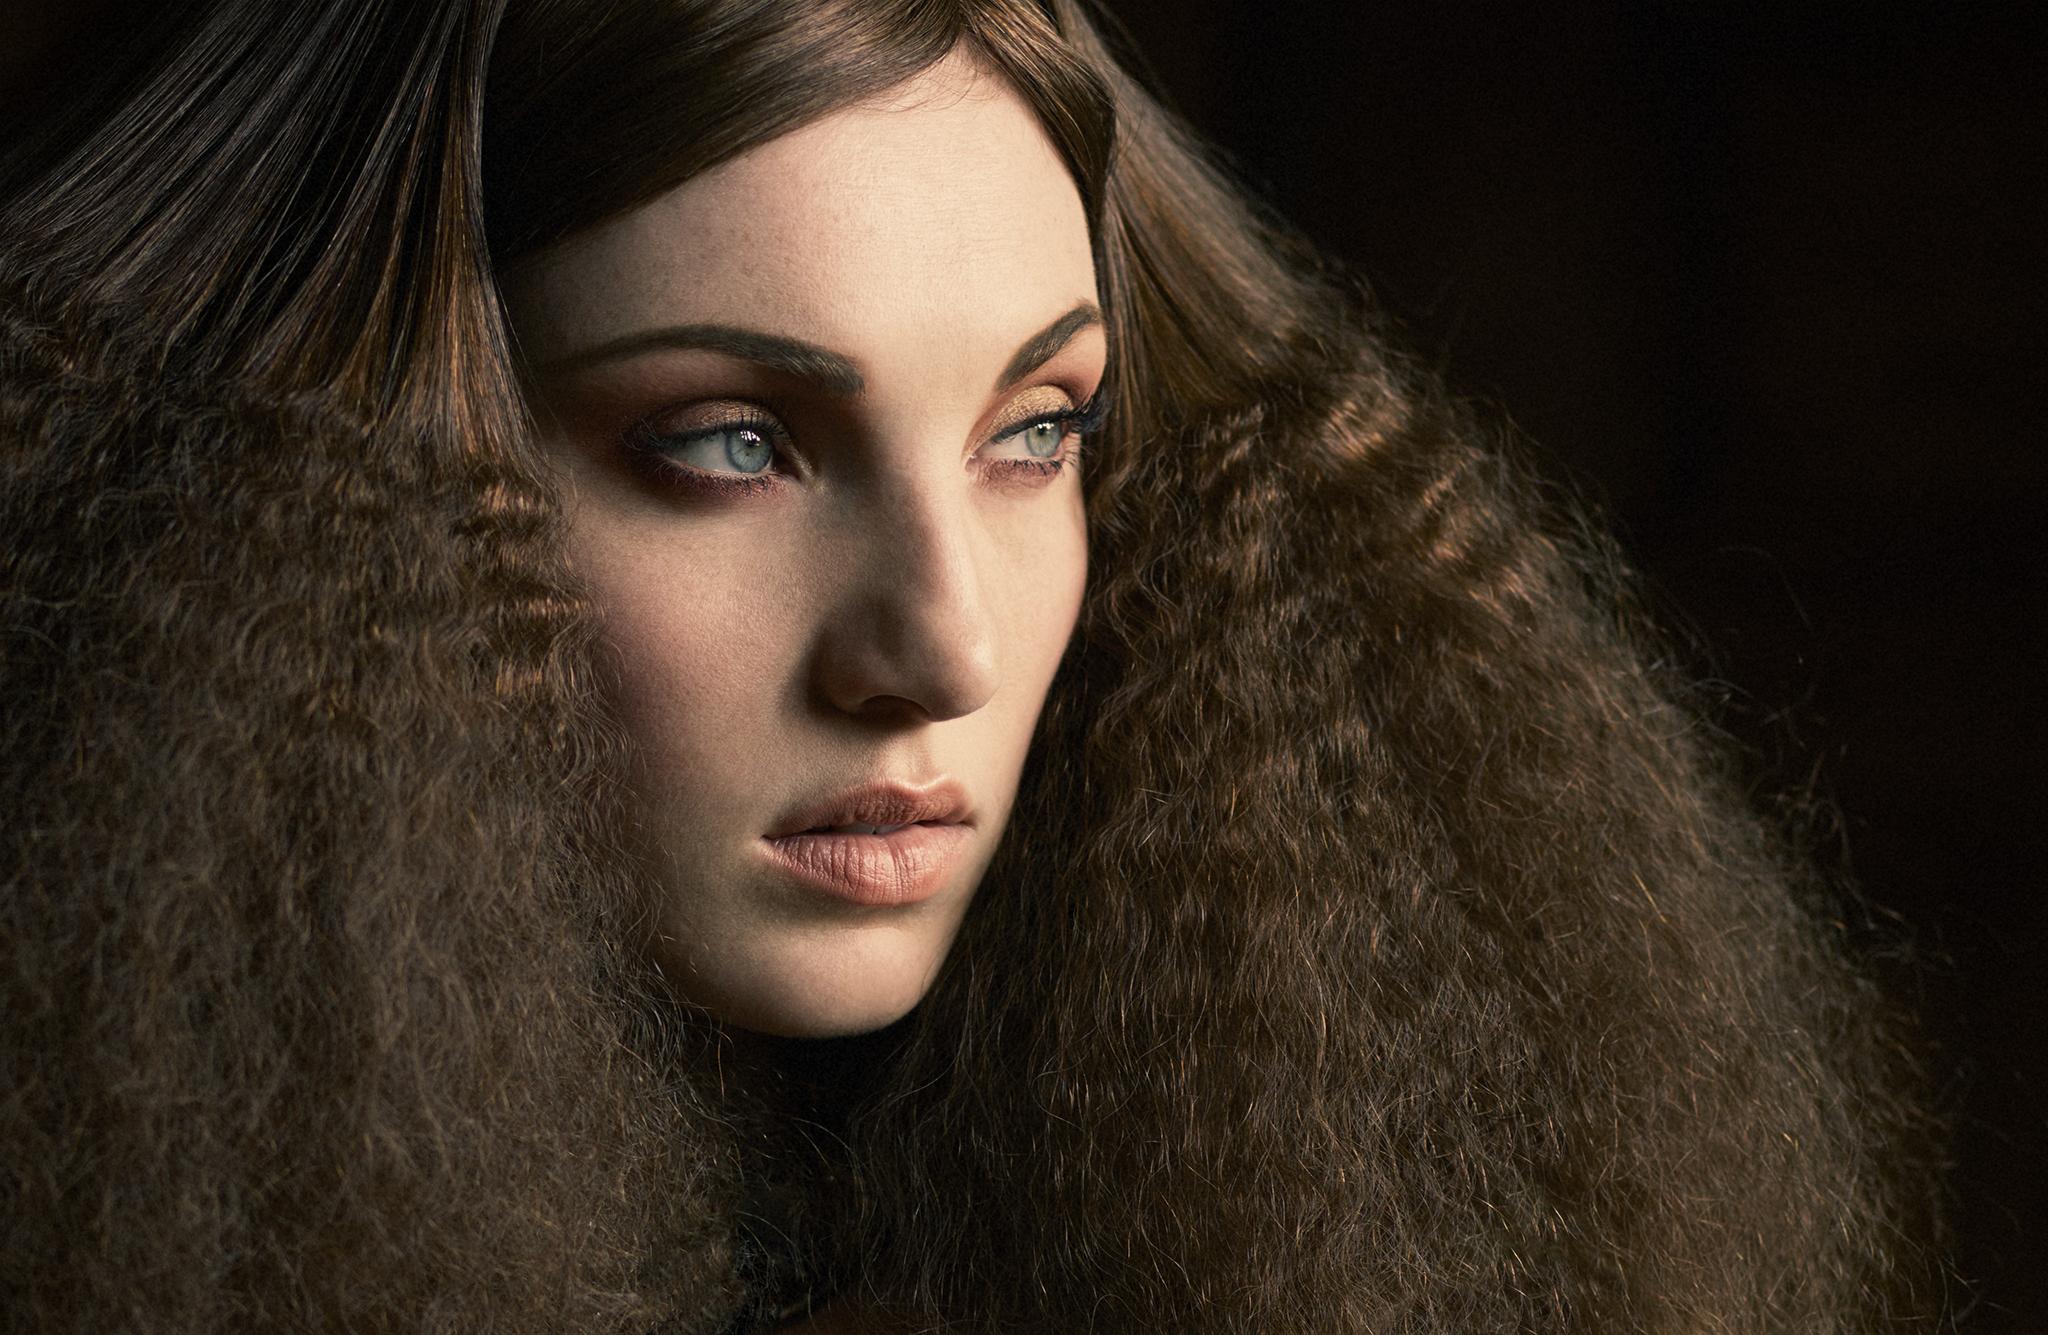 Model: Annabelle L   Stylist: Leonid Gurevich   Hair: Lorenzo Diaz      Makeup: Aya Kudo   Stylist's assistant: Marina Gurevich   Photographer's Assistant: Ryan Toussieng